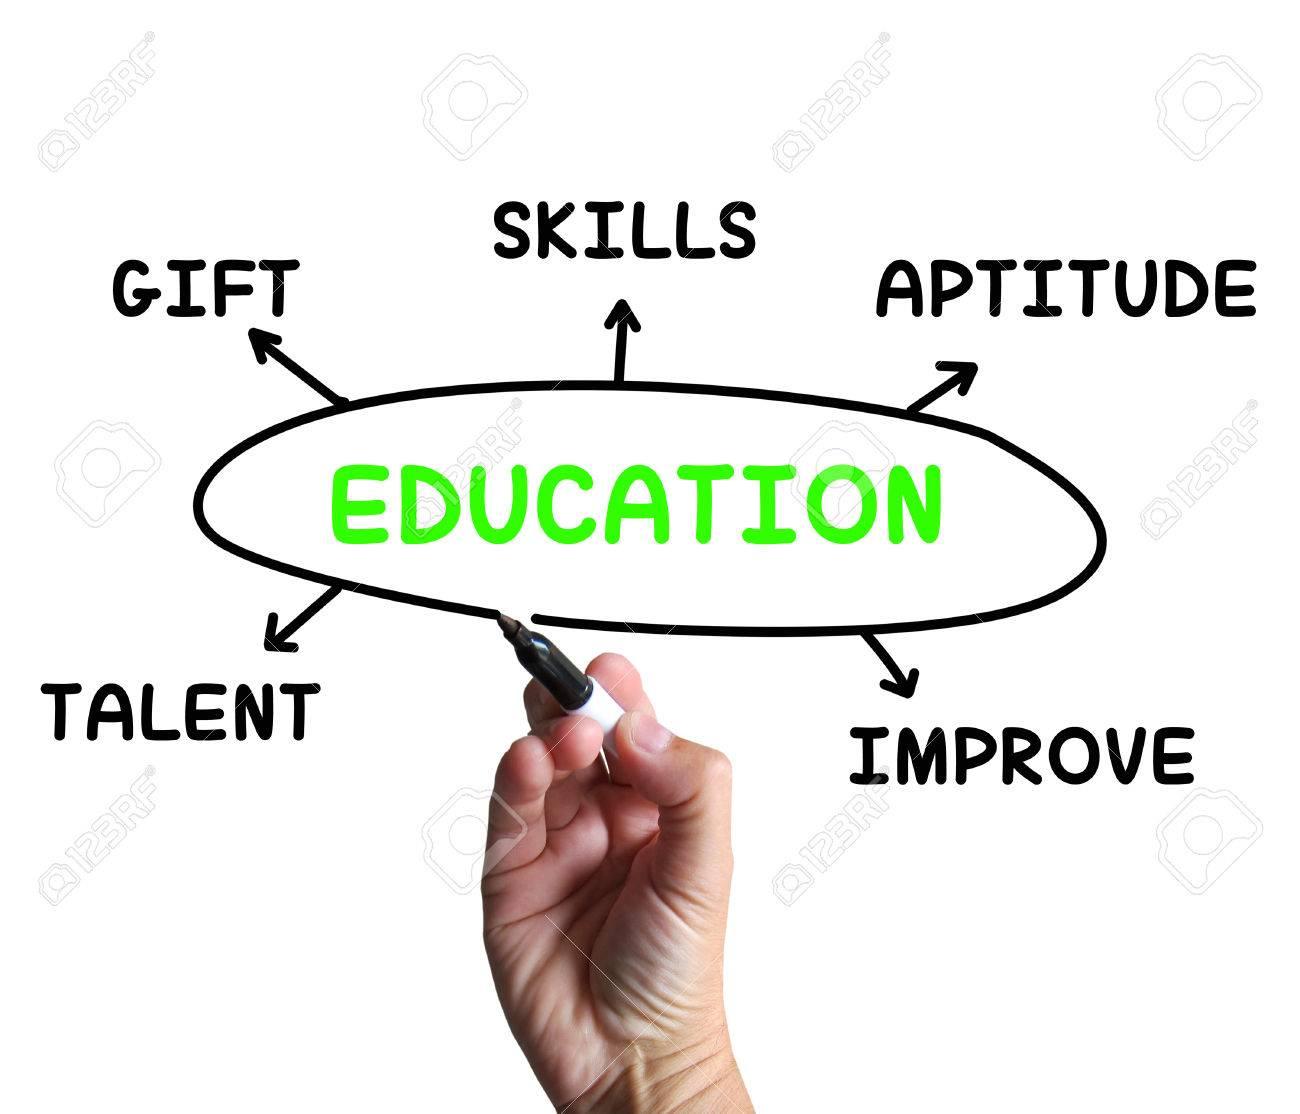 education diagram meaning aptitude knowledge and improving stock    stock photo   education diagram meaning aptitude knowledge and improving